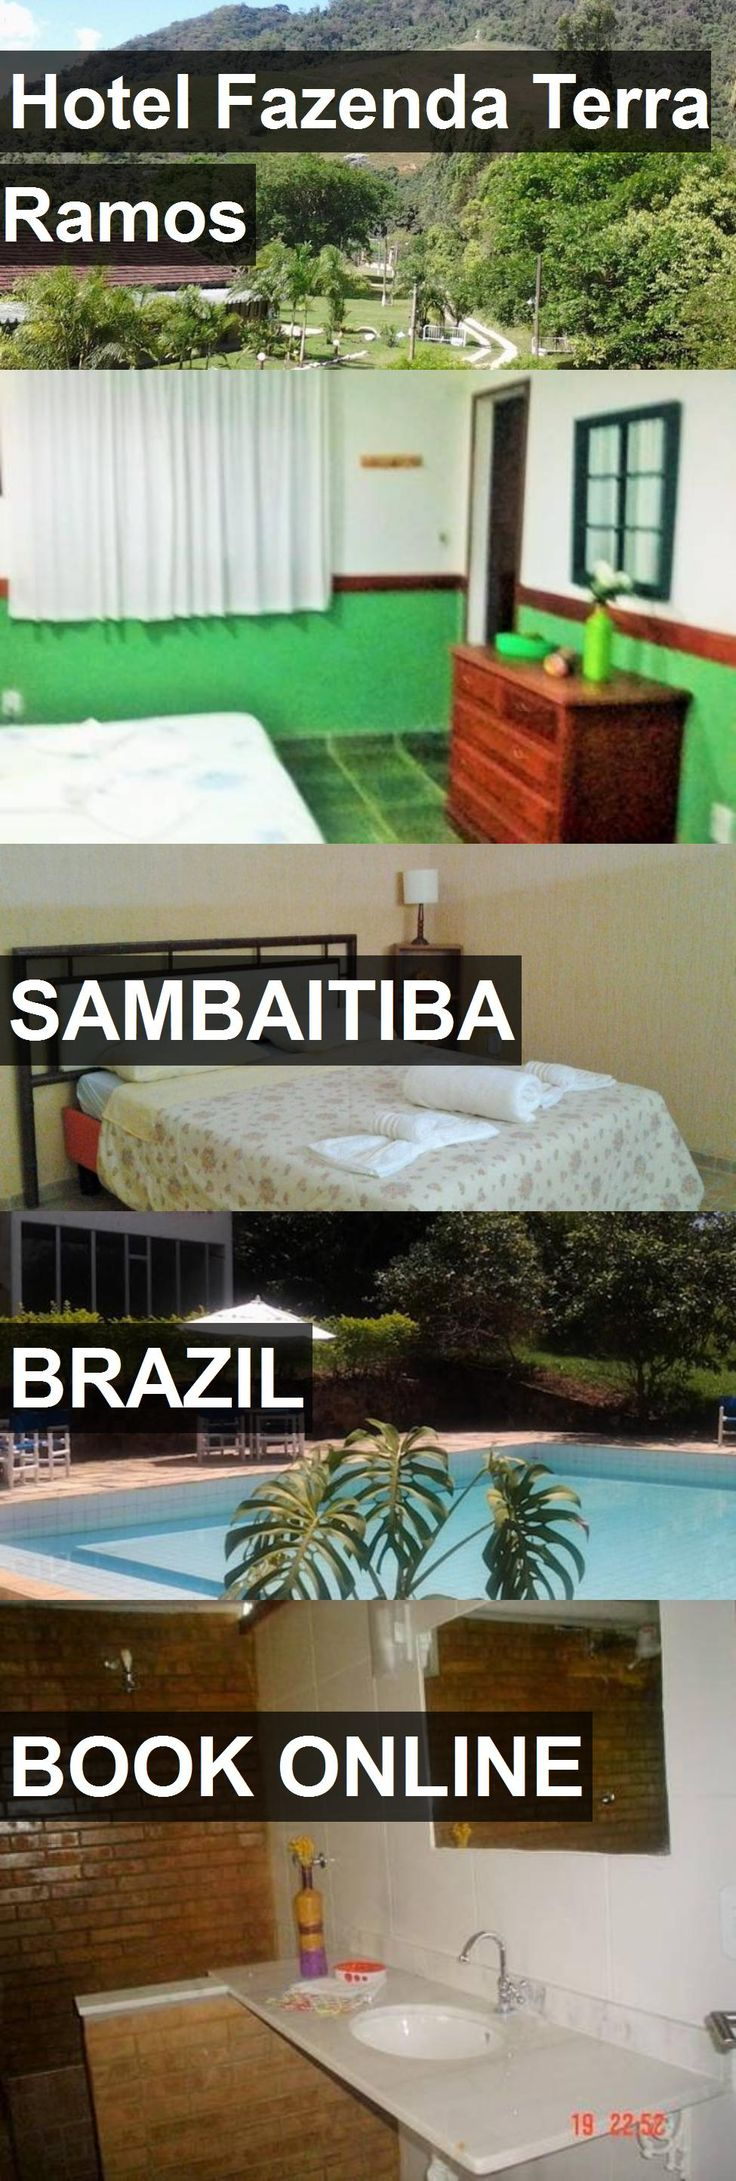 Hotel Fazenda Terra Ramos in Sambaitiba, Brazil. For more information, photos, reviews and best prices please follow the link. #Brazil #Sambaitiba #travel #vacation #hotel